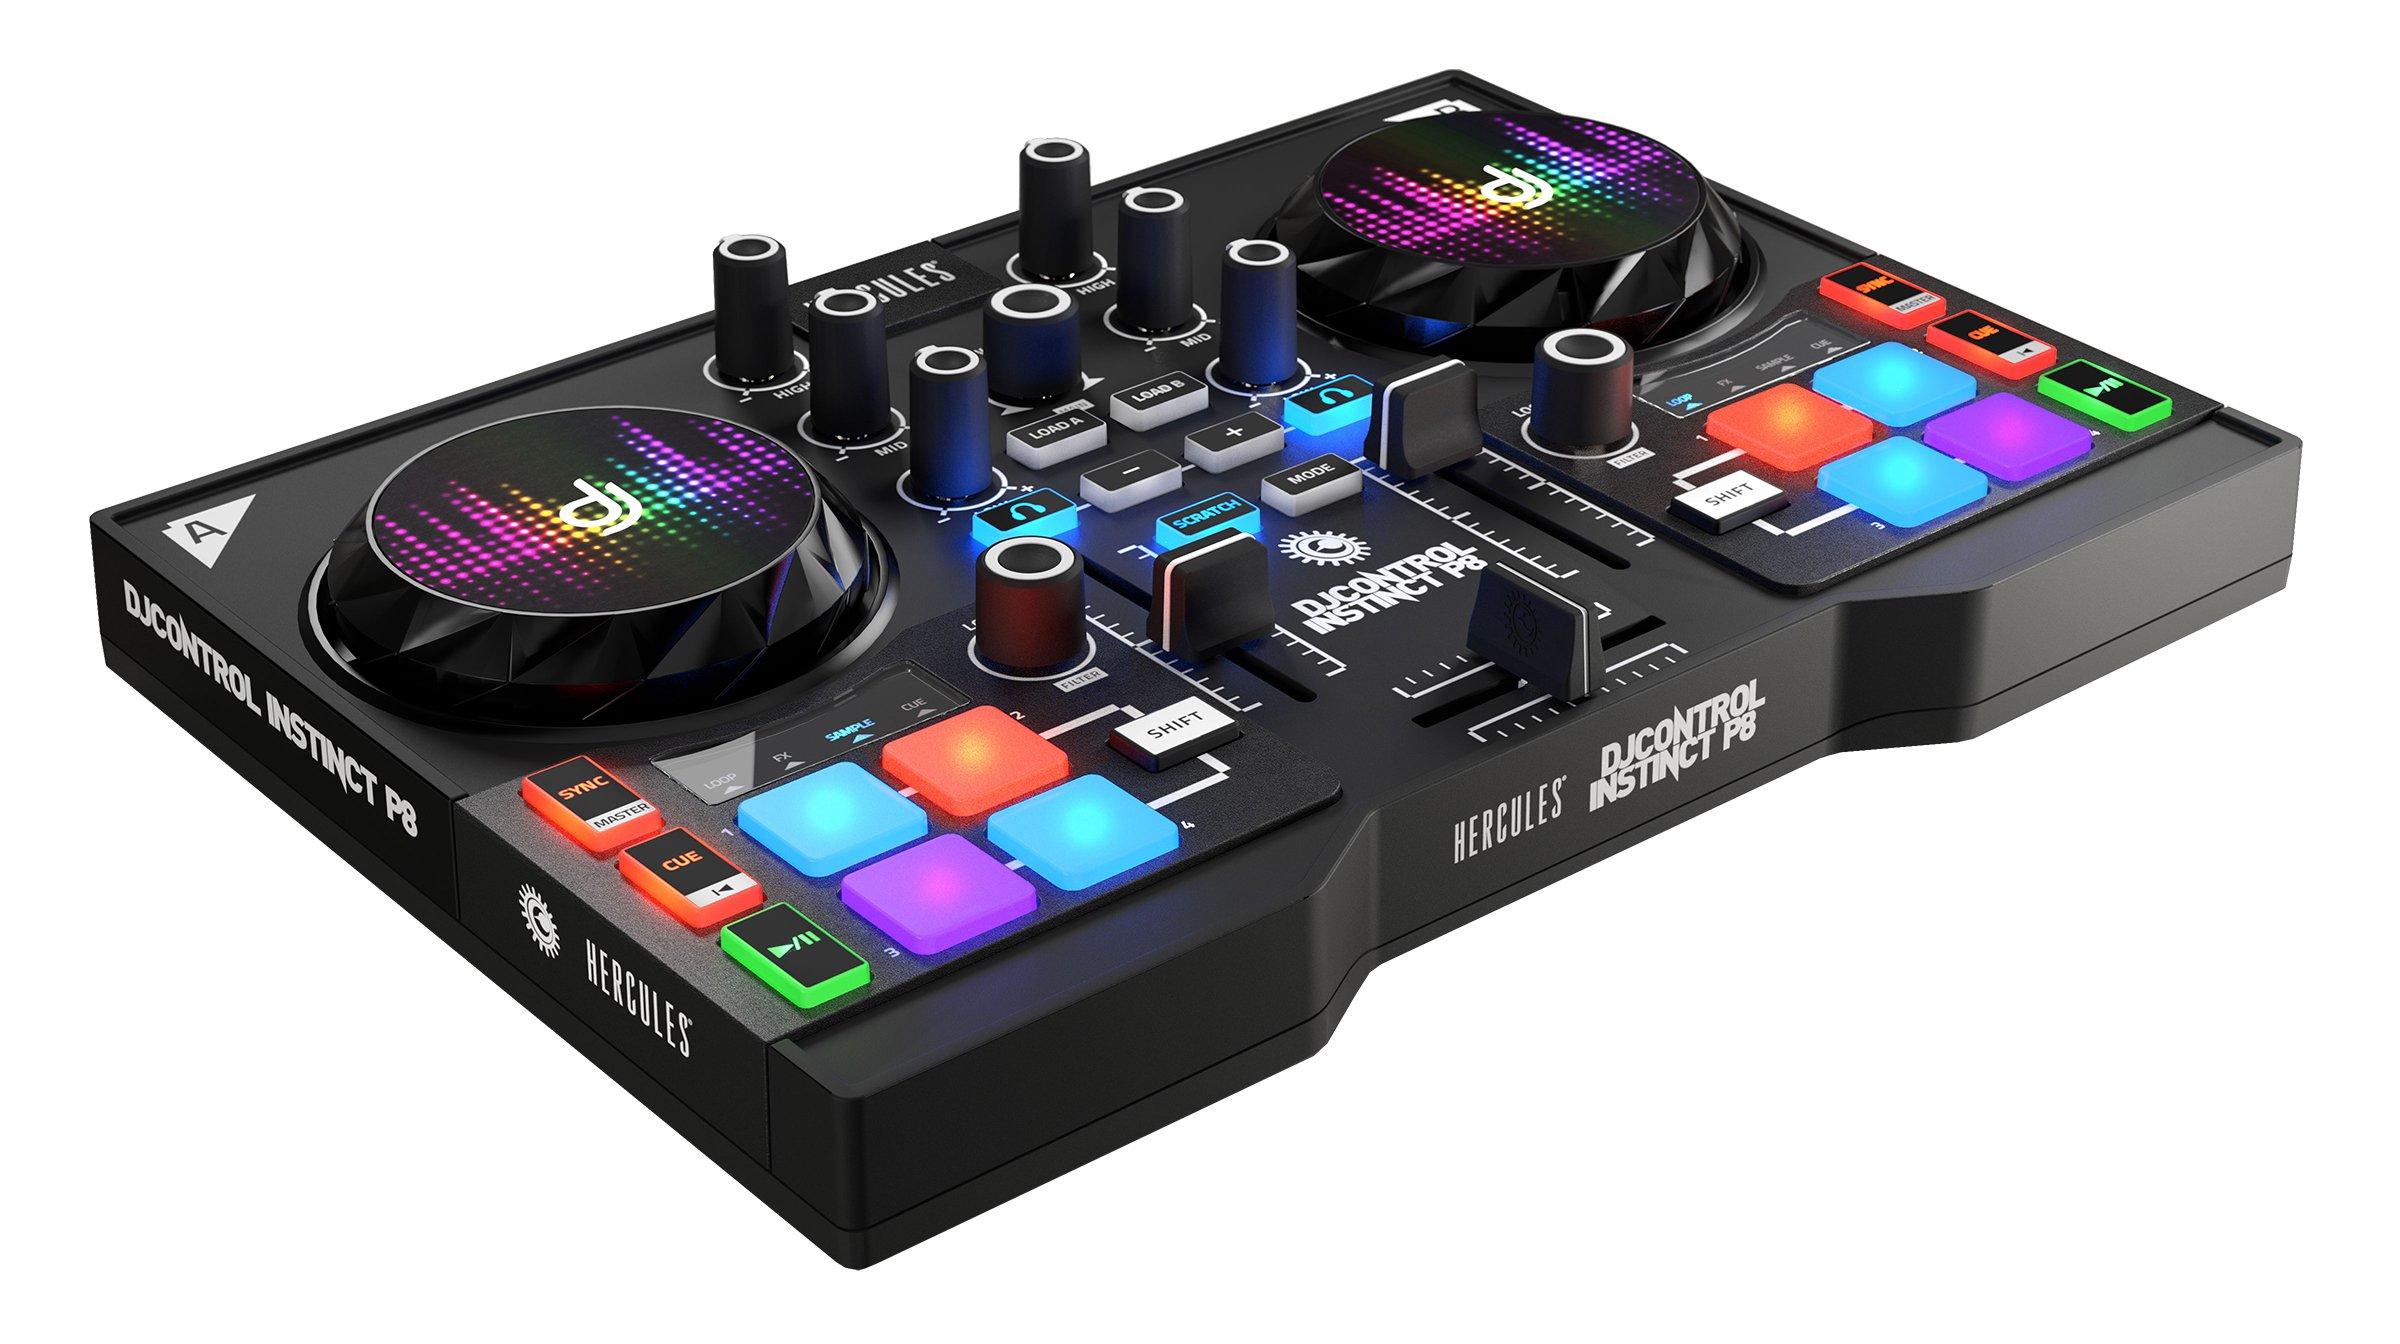 INSTINCT P8 2CHANNELS NEGRO CONTROLADOR DJ